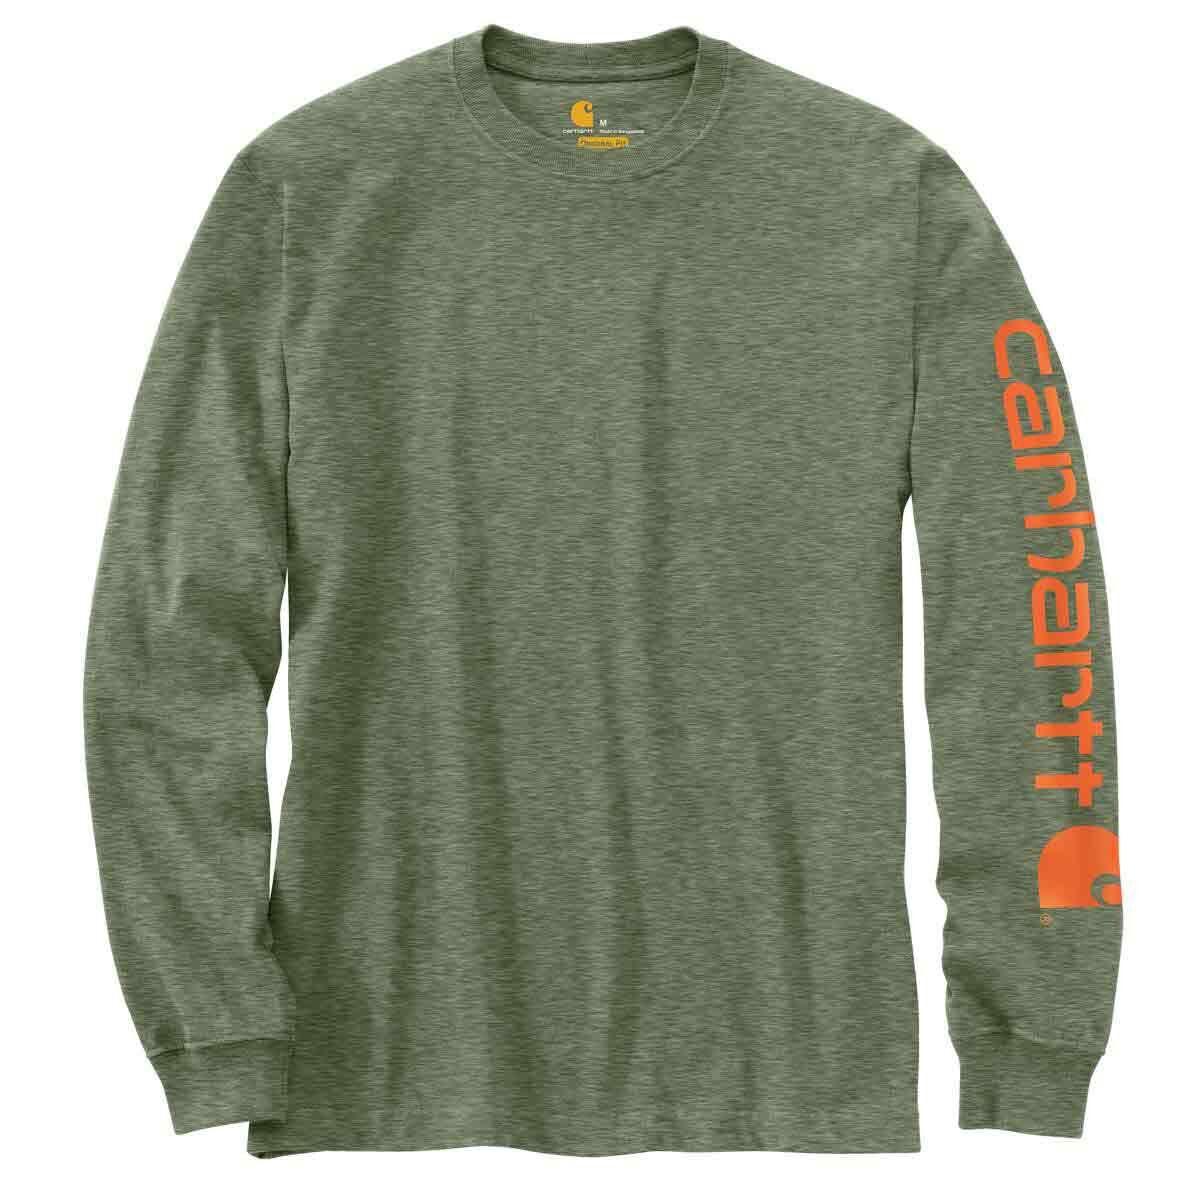 Carhartt Men's Long-Sleeve Graphic Logo Tee - Green, S